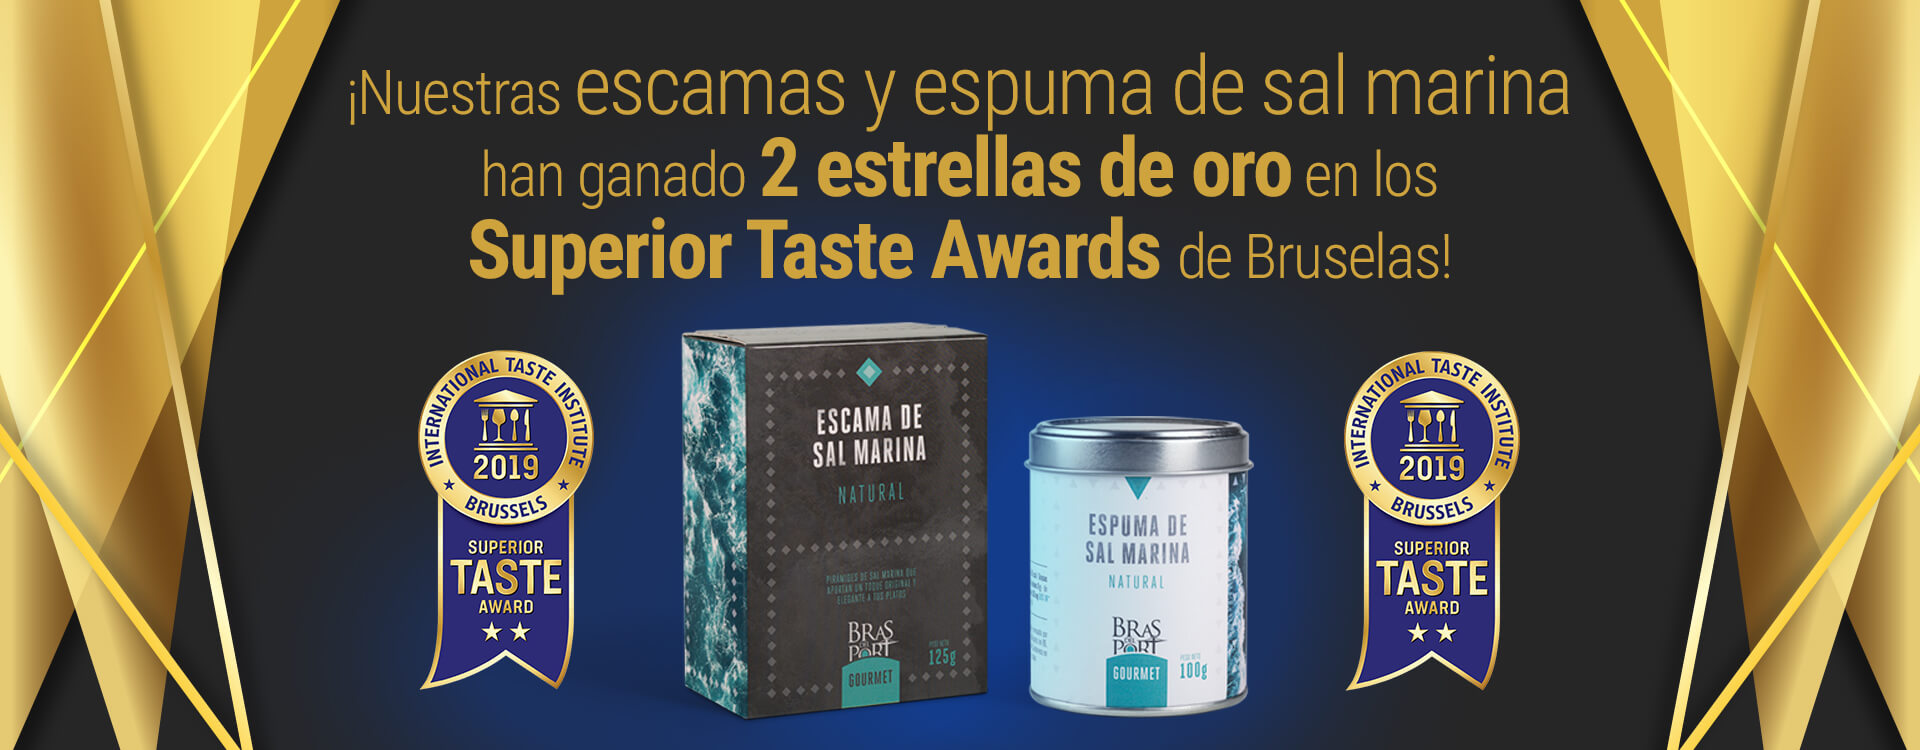 Portada Superior Taste Awards tienda